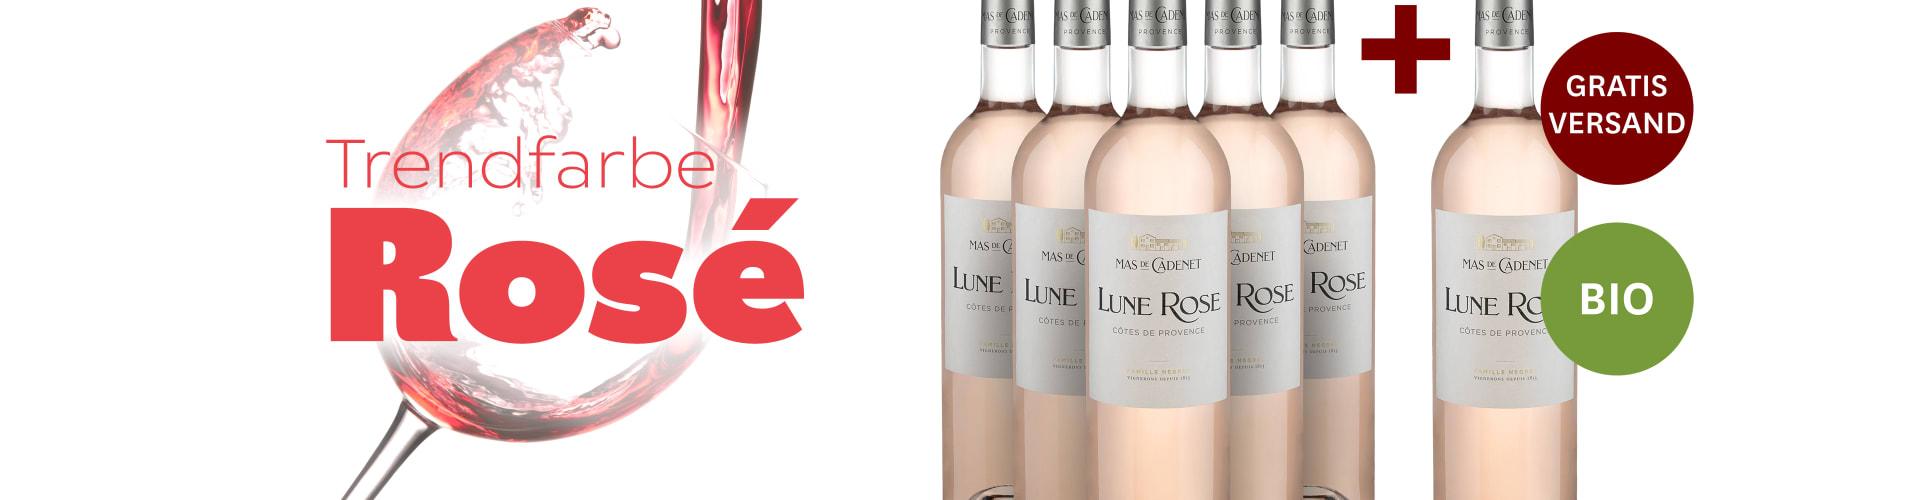 Rosé-Spezial mit neuem Jahrgang!